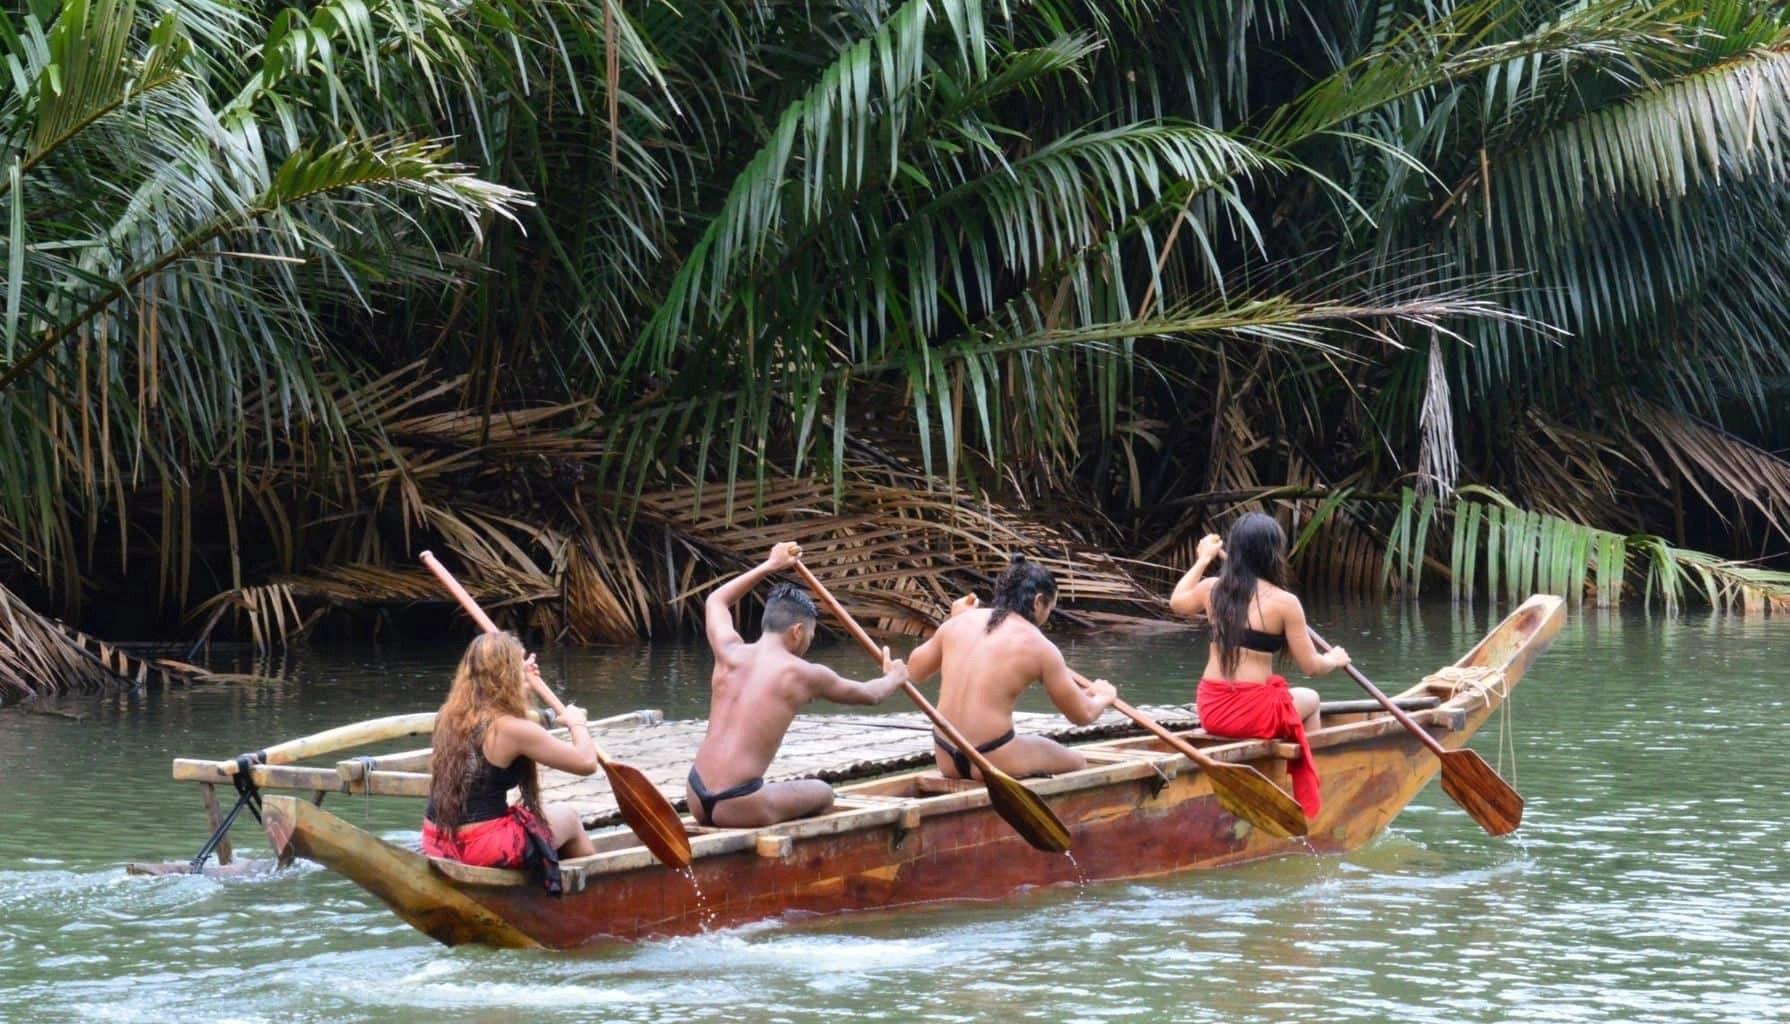 Valley of the Latte River Festival II, Guam, Festival, Events, Fun, Tours